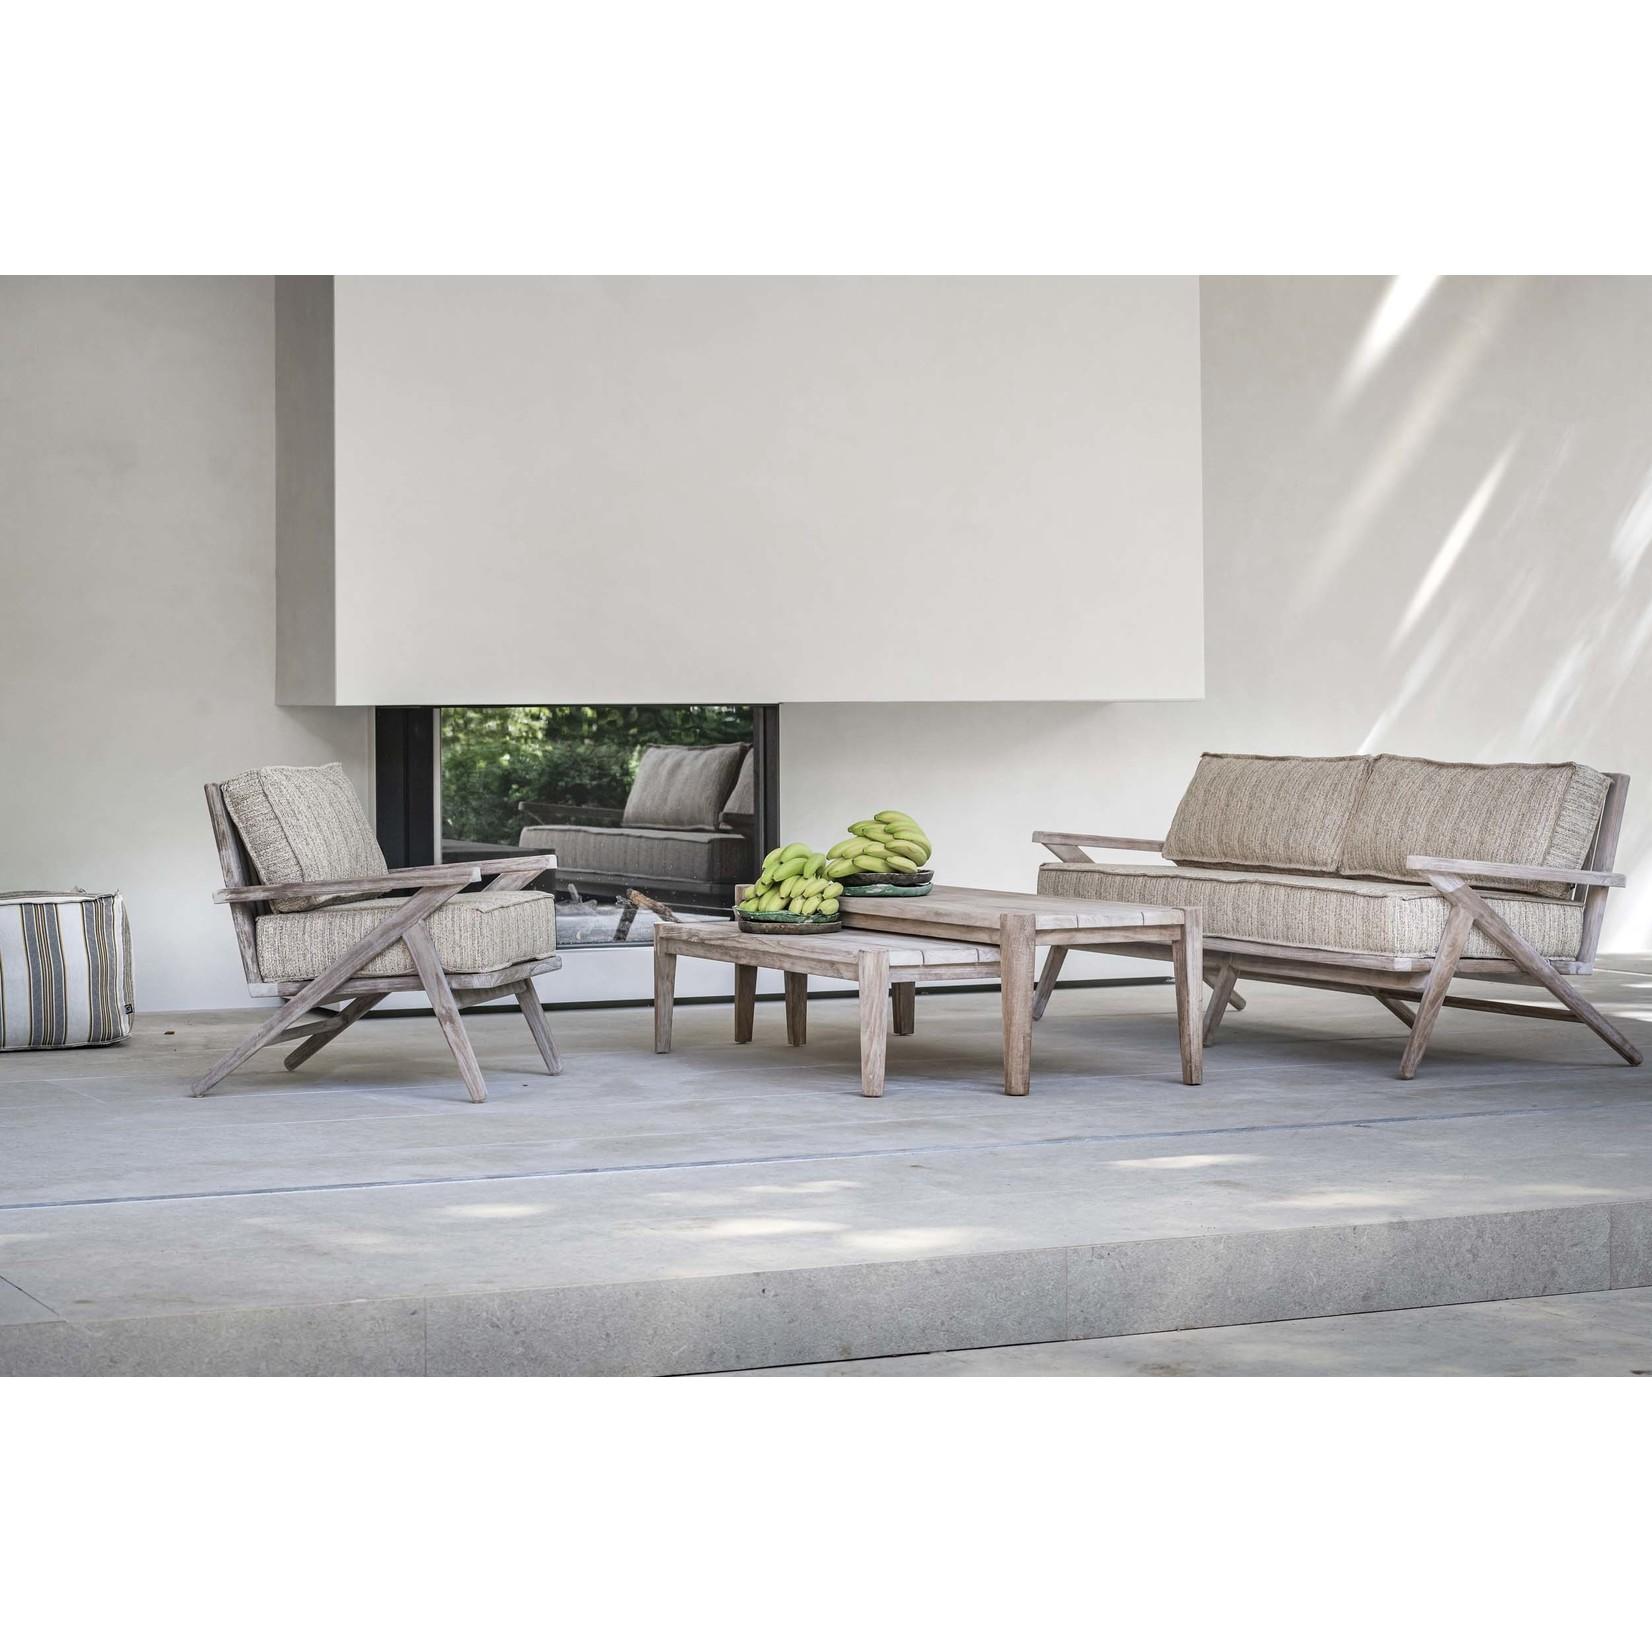 Gommaire Rectangular Coffee Table Floor Large   Reclaimed Teak Natural Gray